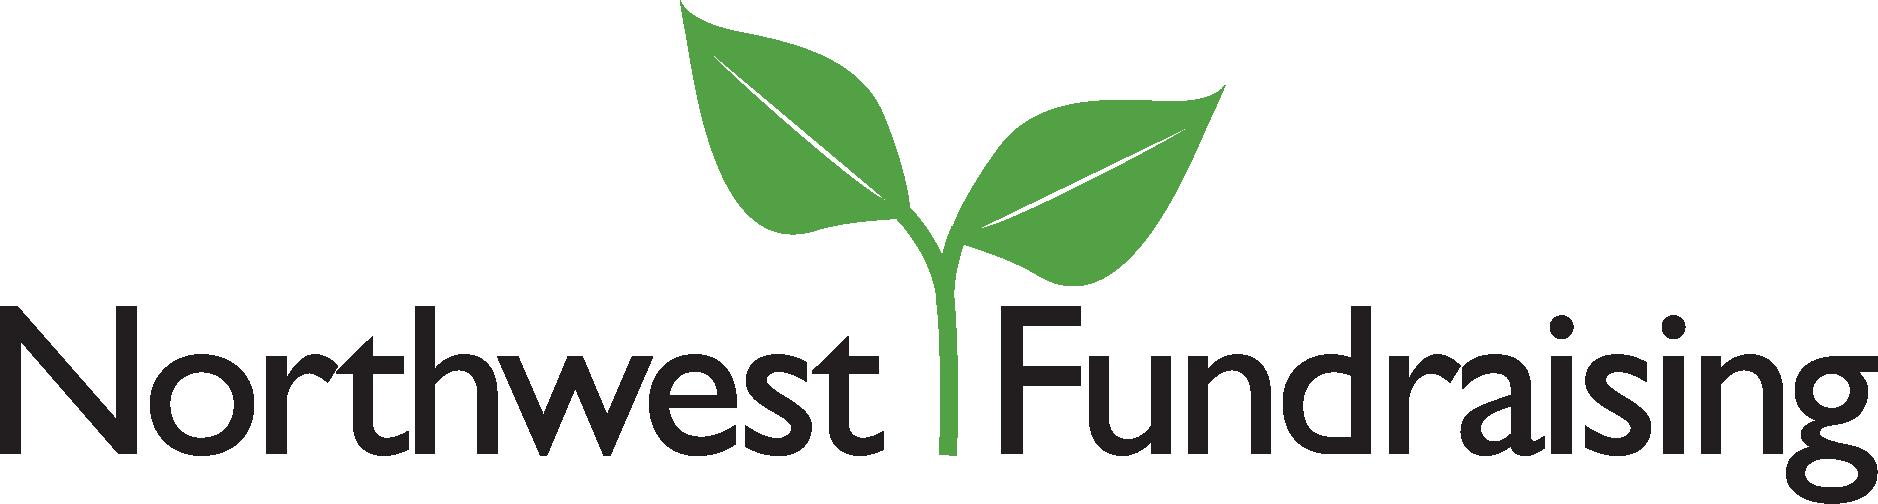 nwf logo brighter green 2016